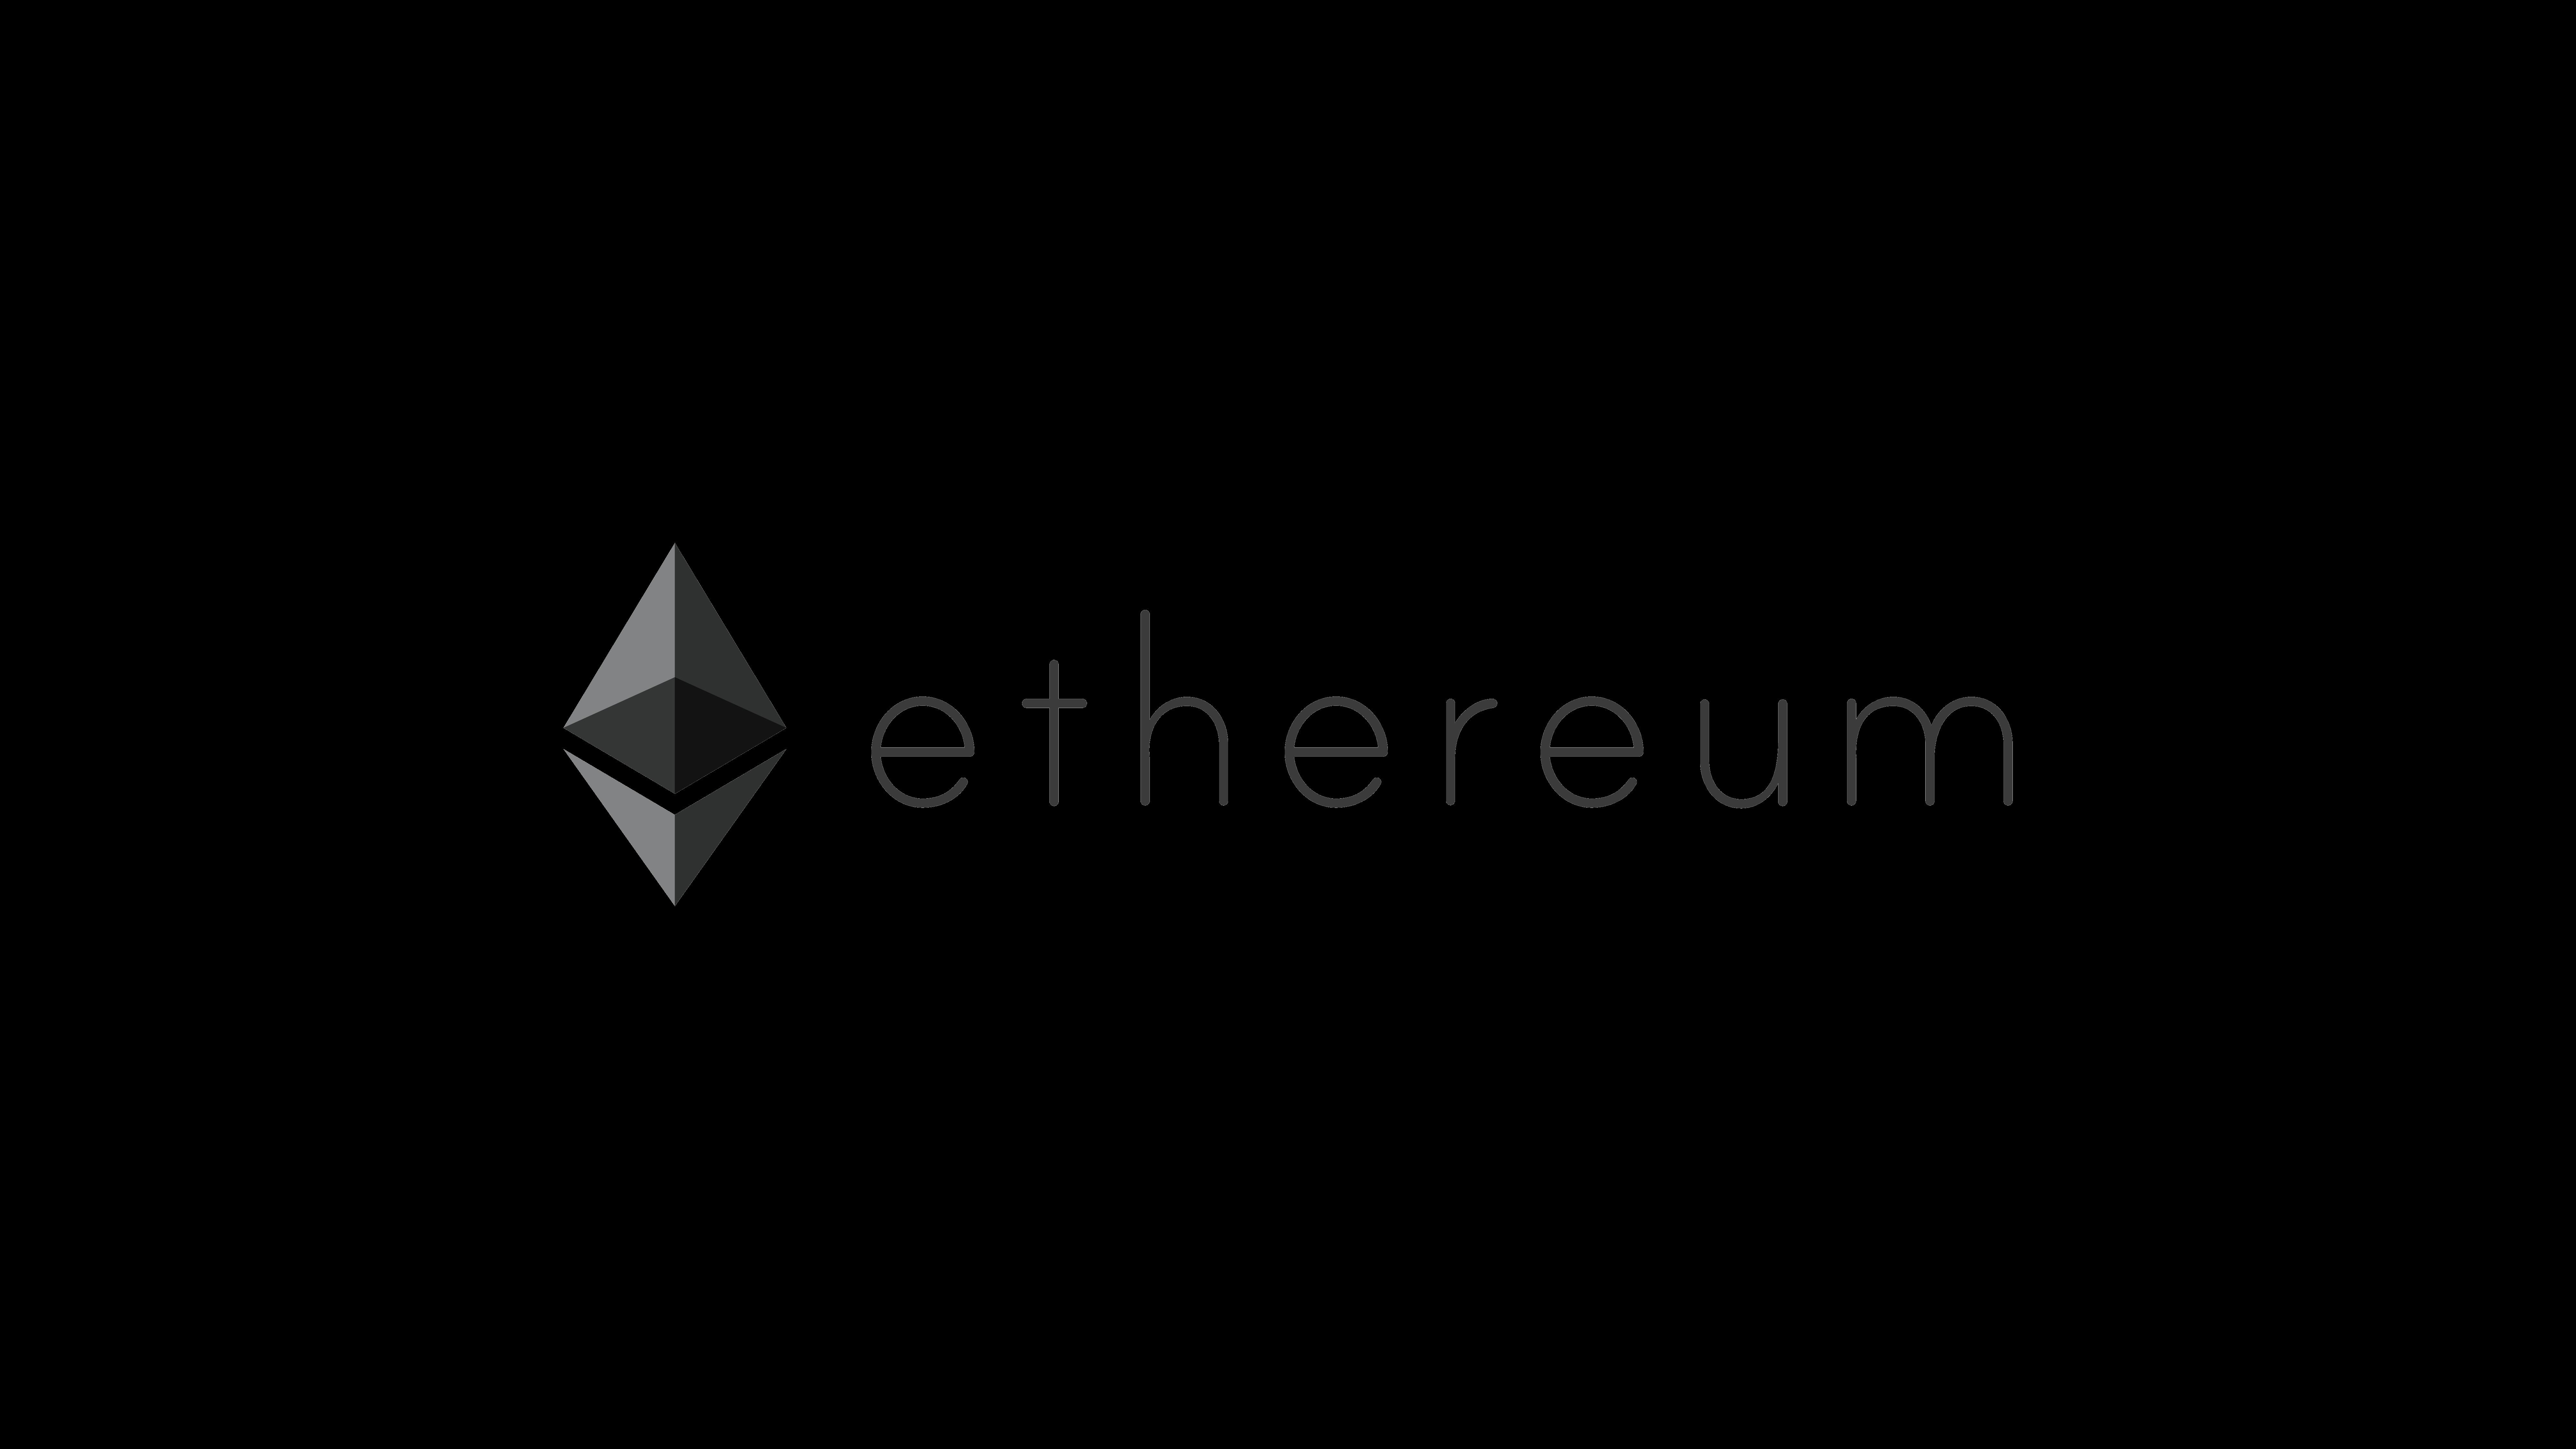 ethereum-wallpaper